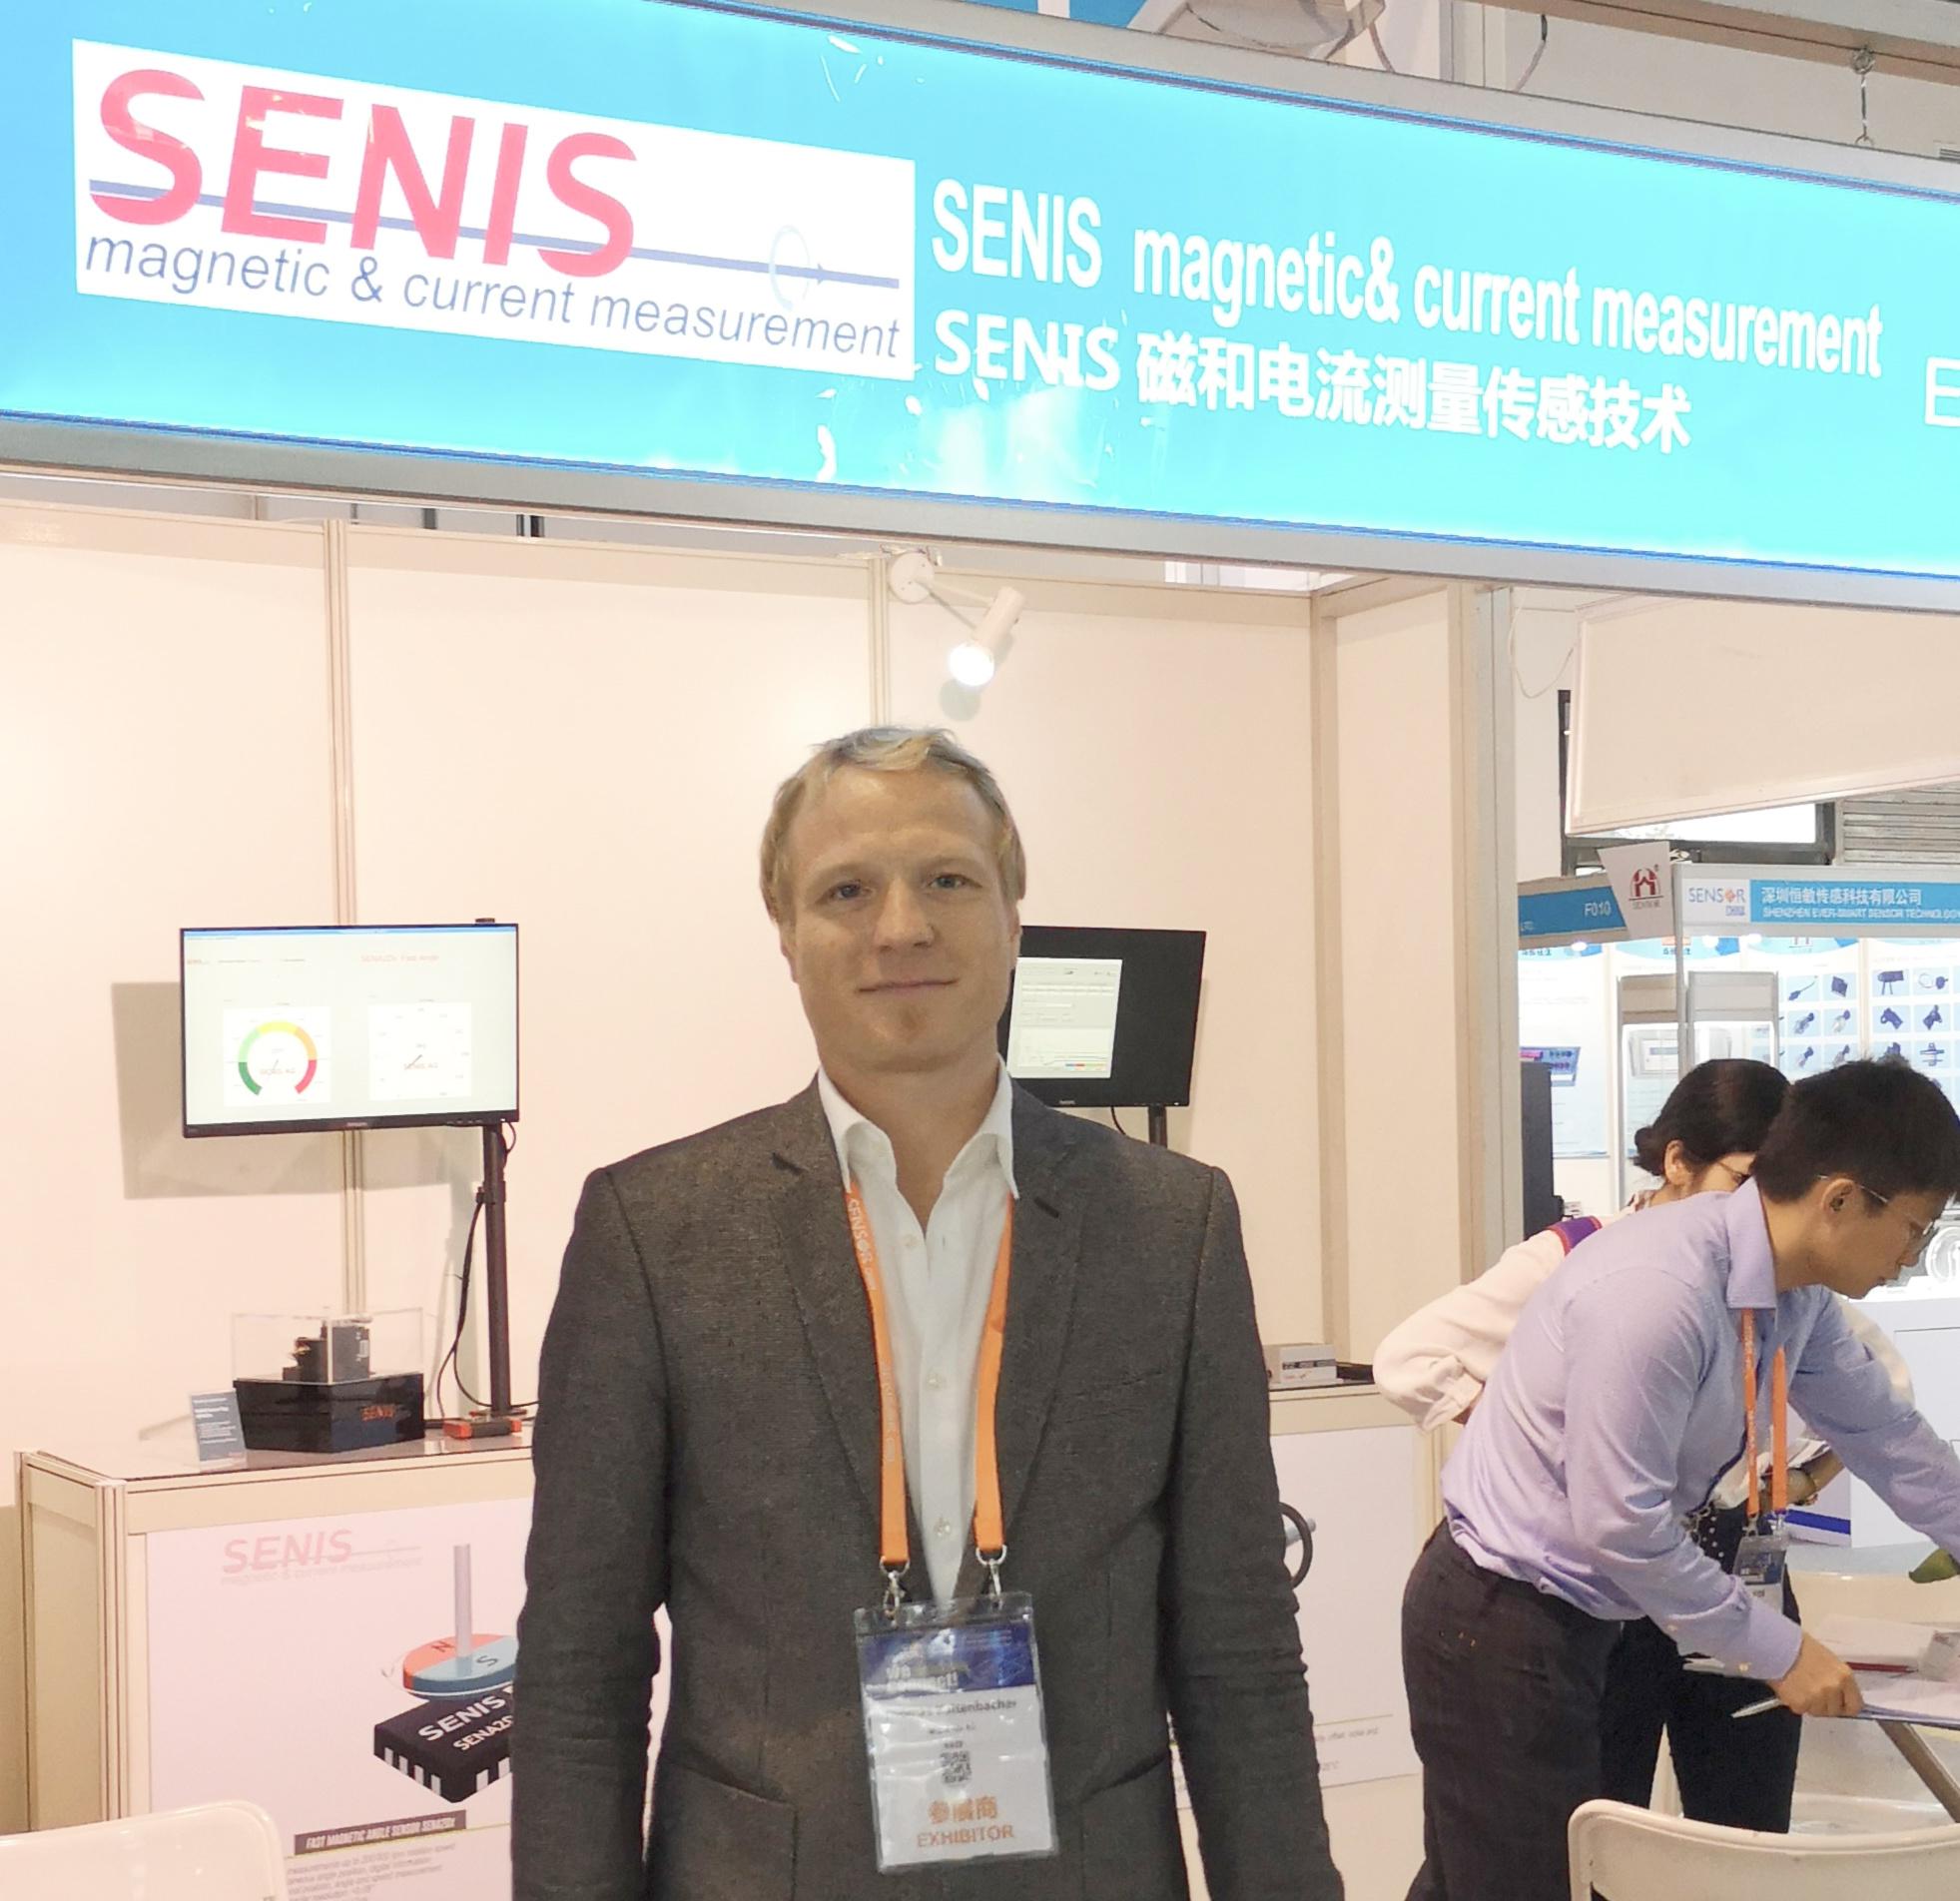 Kaltenbancher表示,Senis的战略是跟中国的企业加强合作。